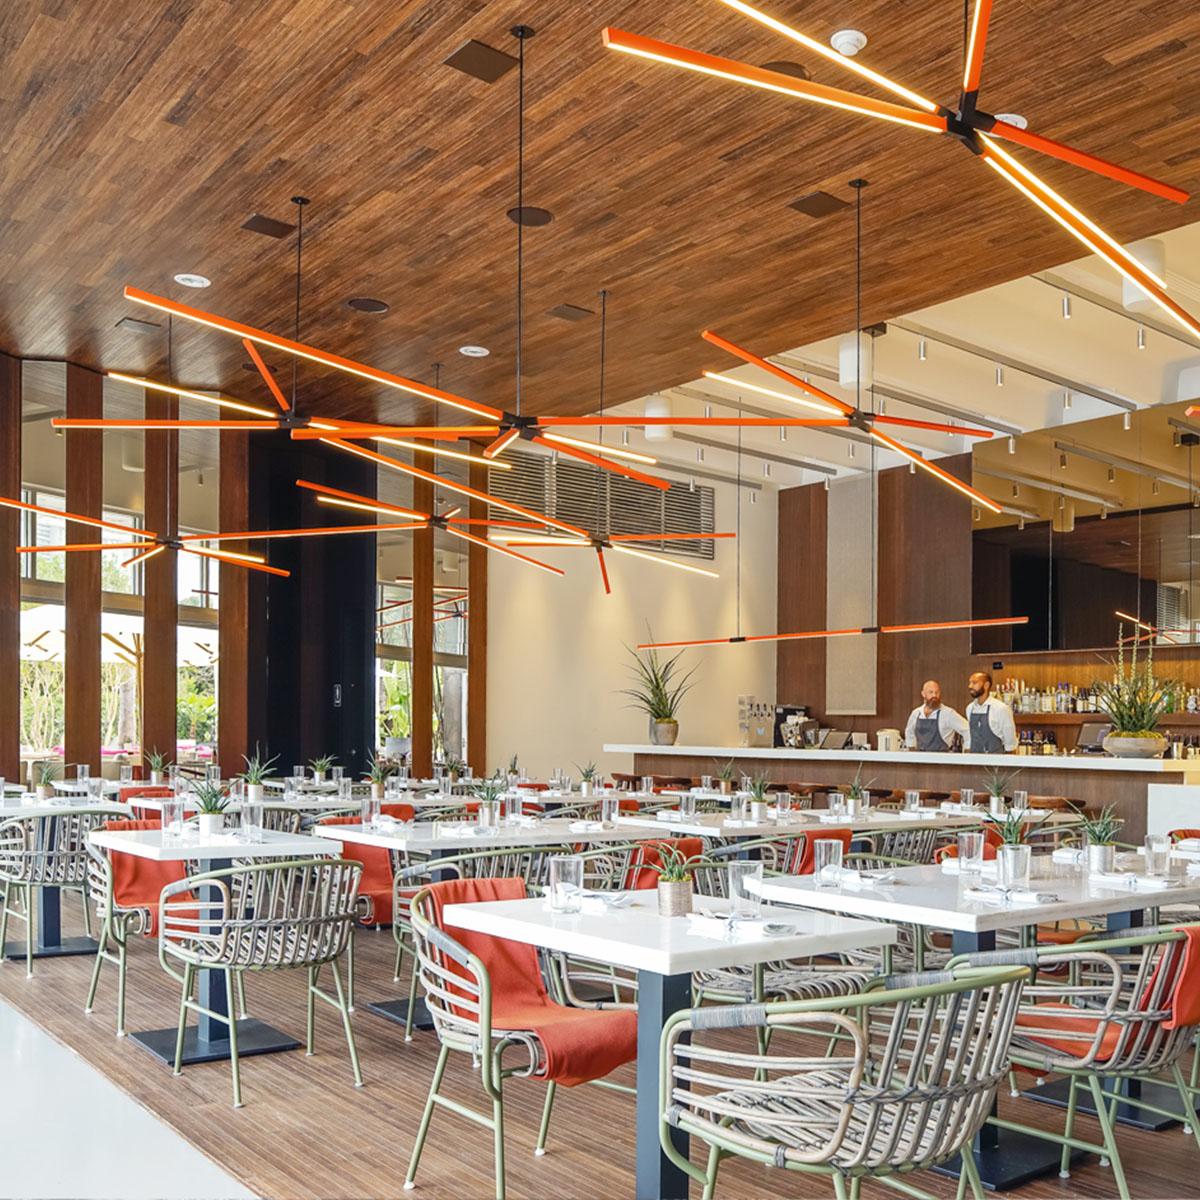 Custom Stickbulb Sky Bang installation in collaboration with Architect, Rene Gonzalez.